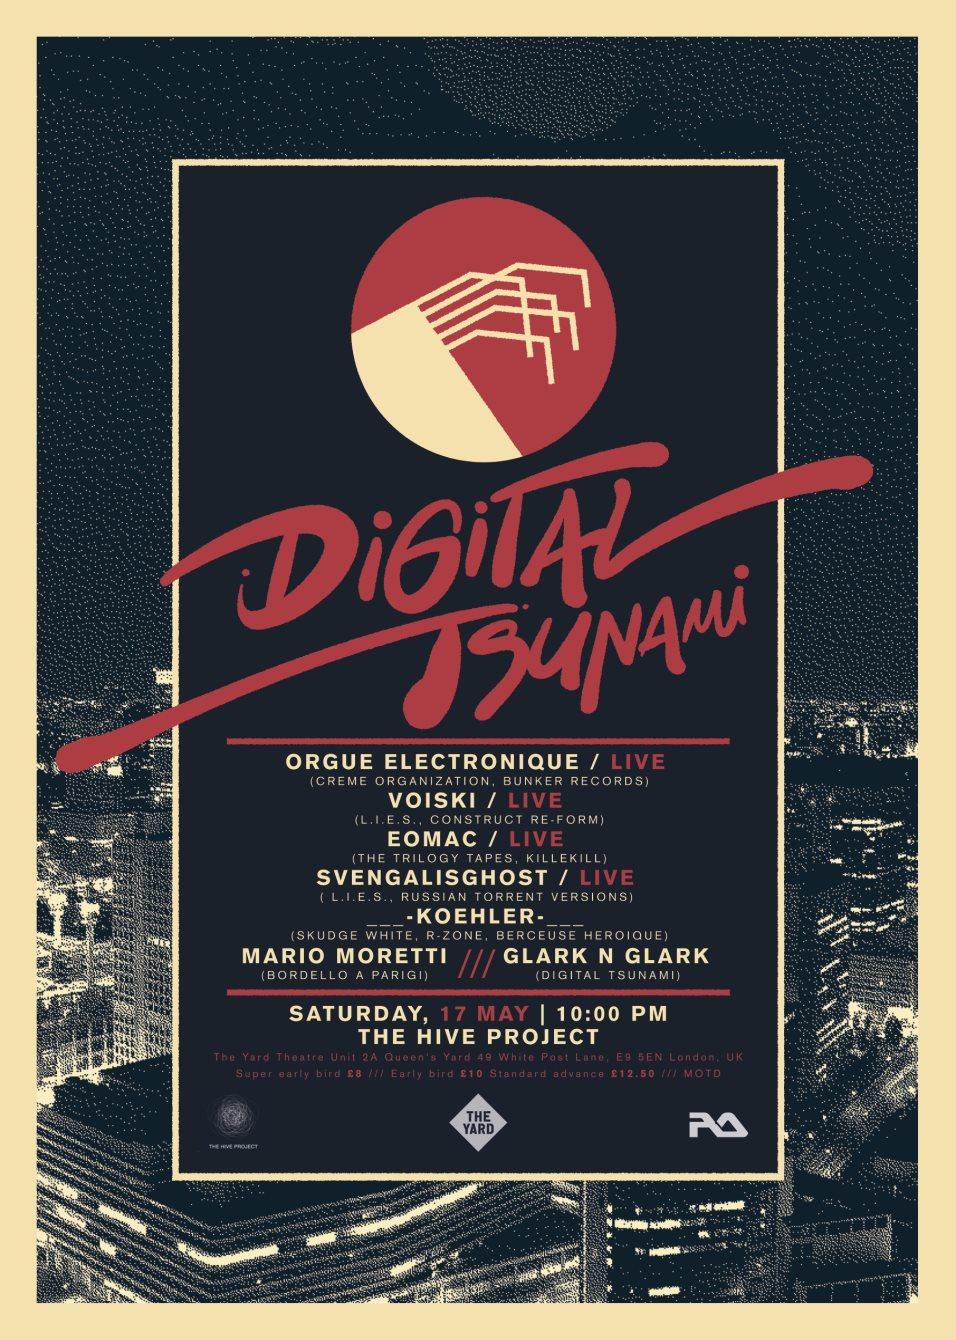 Digital Tsunami: Orgue Electronique, Voiski, Eomac, Svengalisghost, Koehler, Mario Moretti